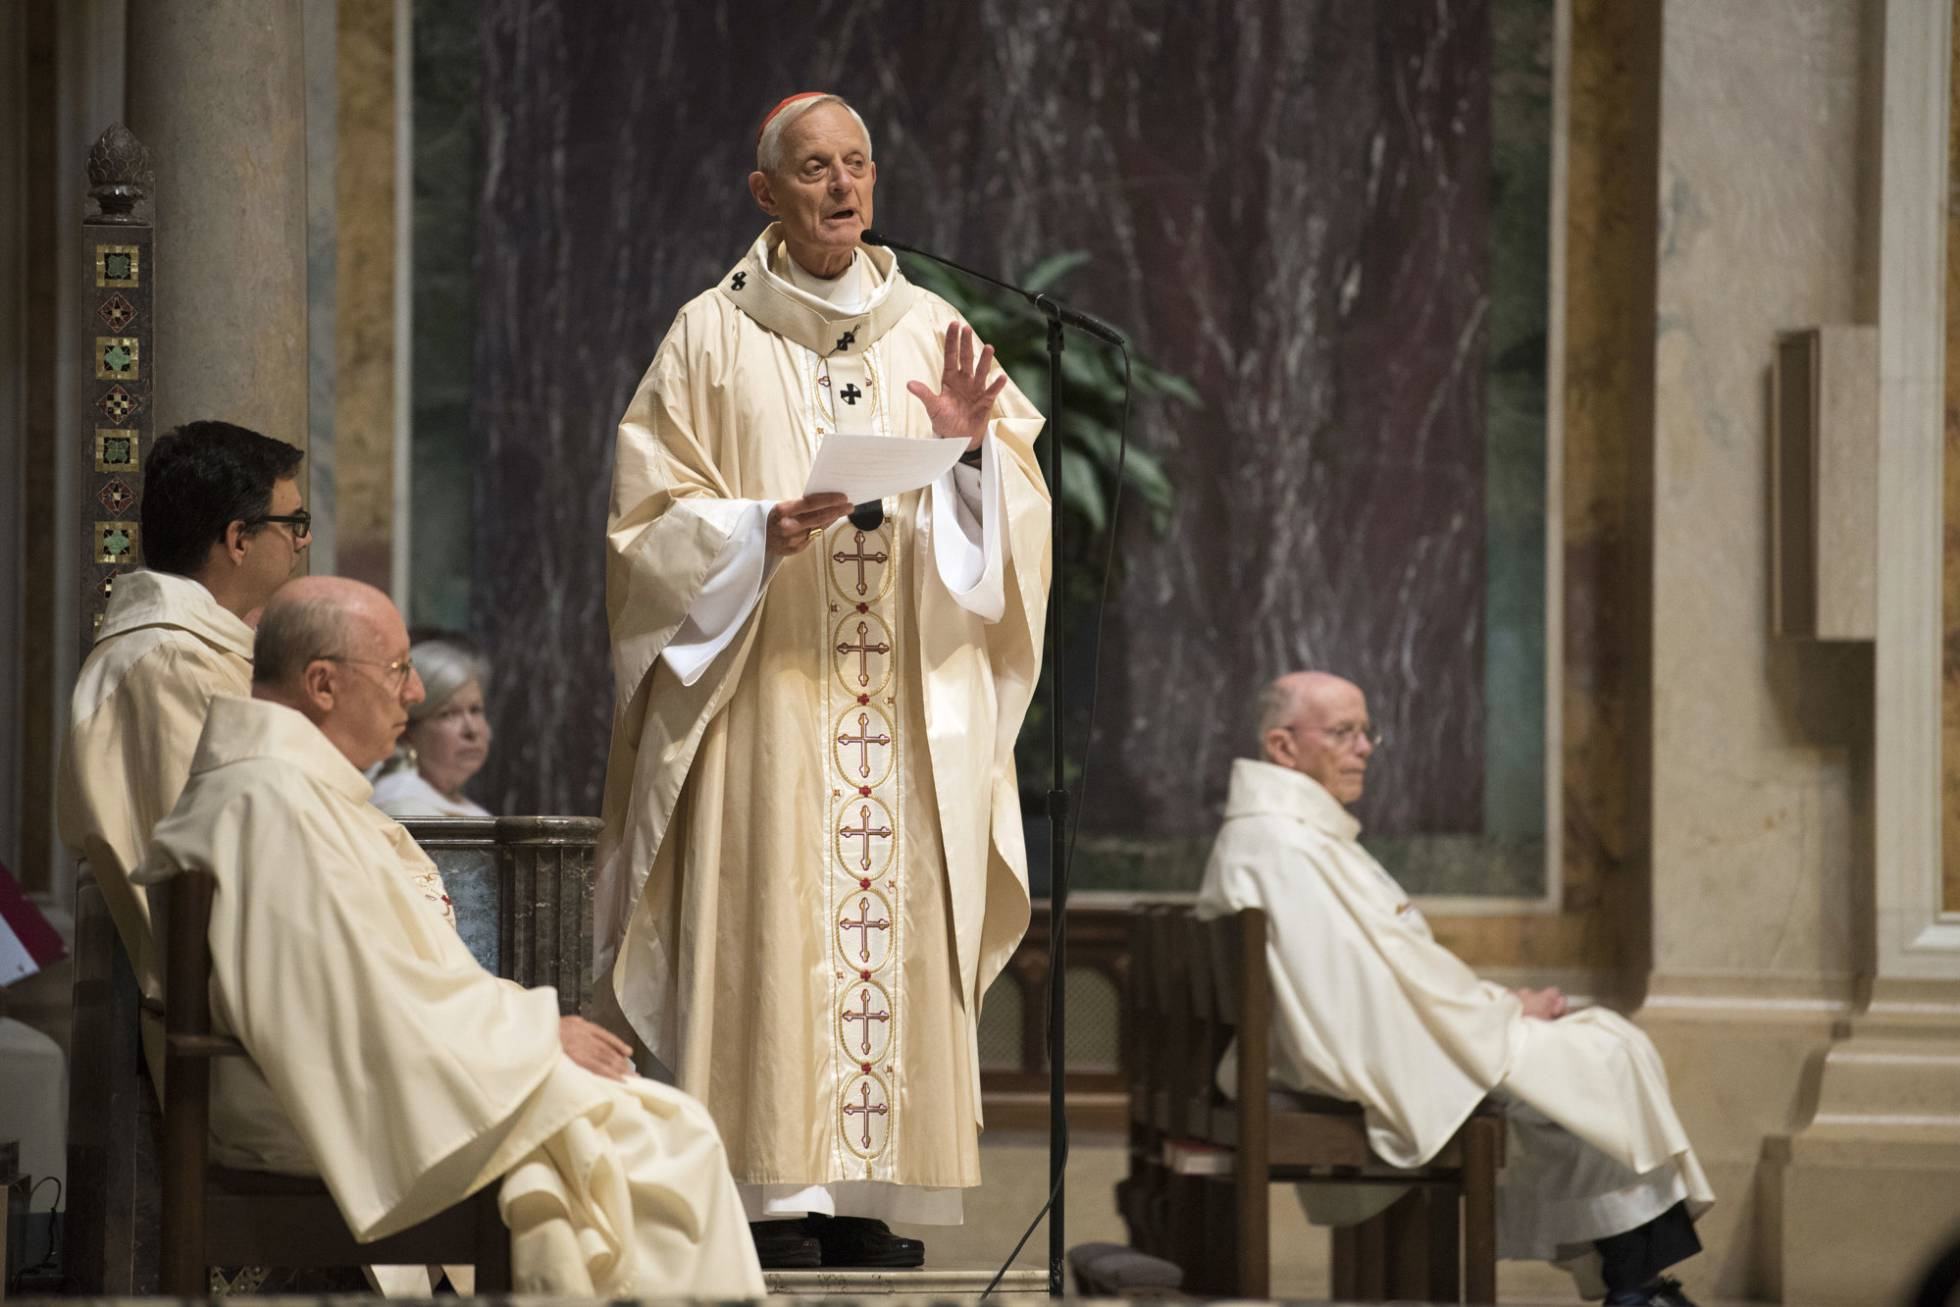 profunda-crisis-en-la-iglesia-catolica-por-curas-pederastas